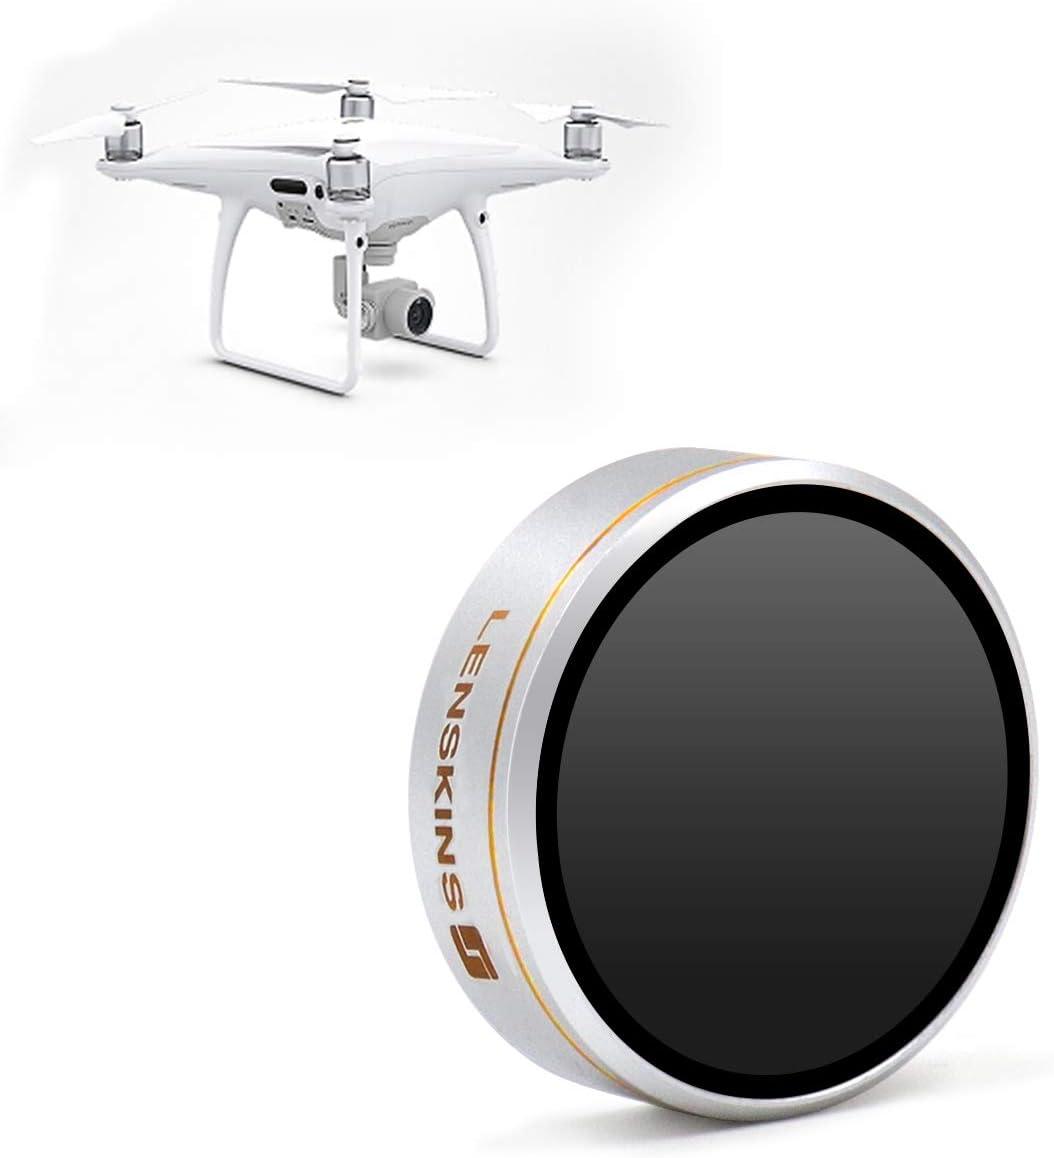 LENSKINS MRC ND8 Camera Lens Filter for DJI Phantom 4 Pro/Pro+/Advance, AGC Optics, Weather-Sealed, Multi-Resistant Coated Neutral Density Filter with Storage Case, Lens Cloth